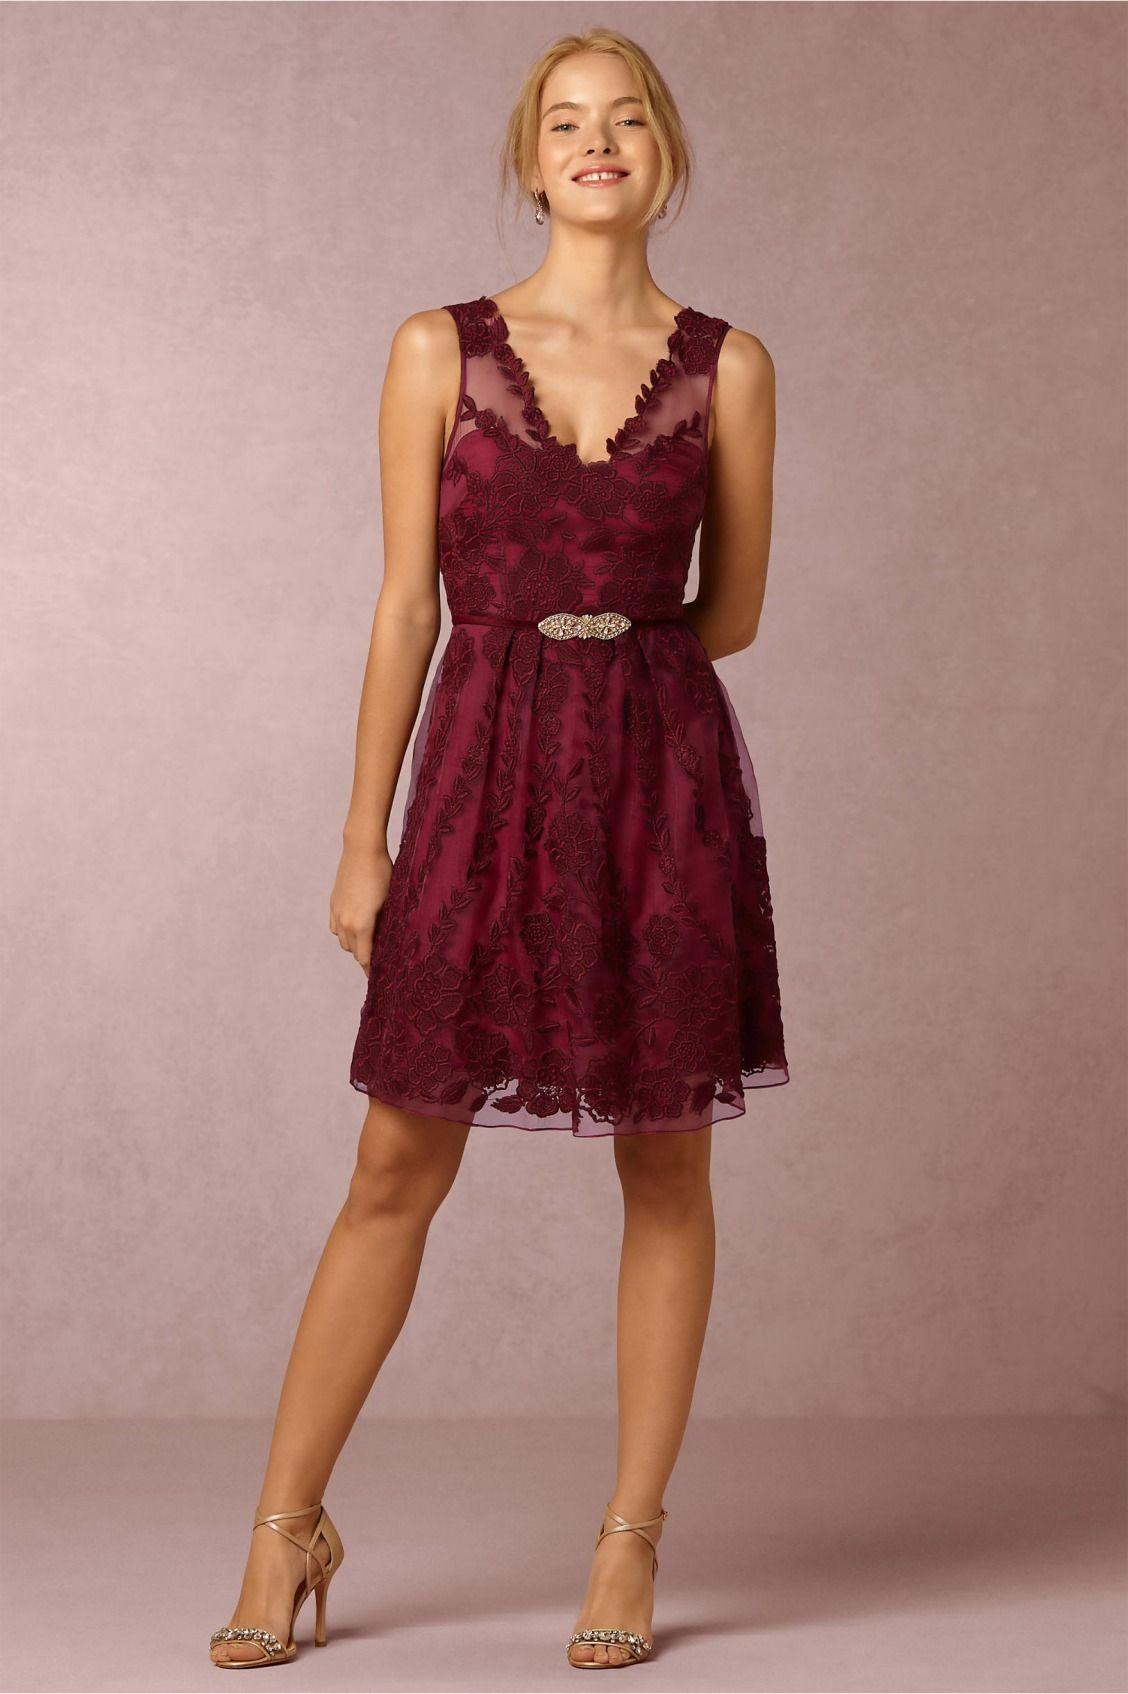 Short maids option ersalina dress in black cherry from bhldn short maids option ersalina dress in black cherry from bhldn ombrellifo Images